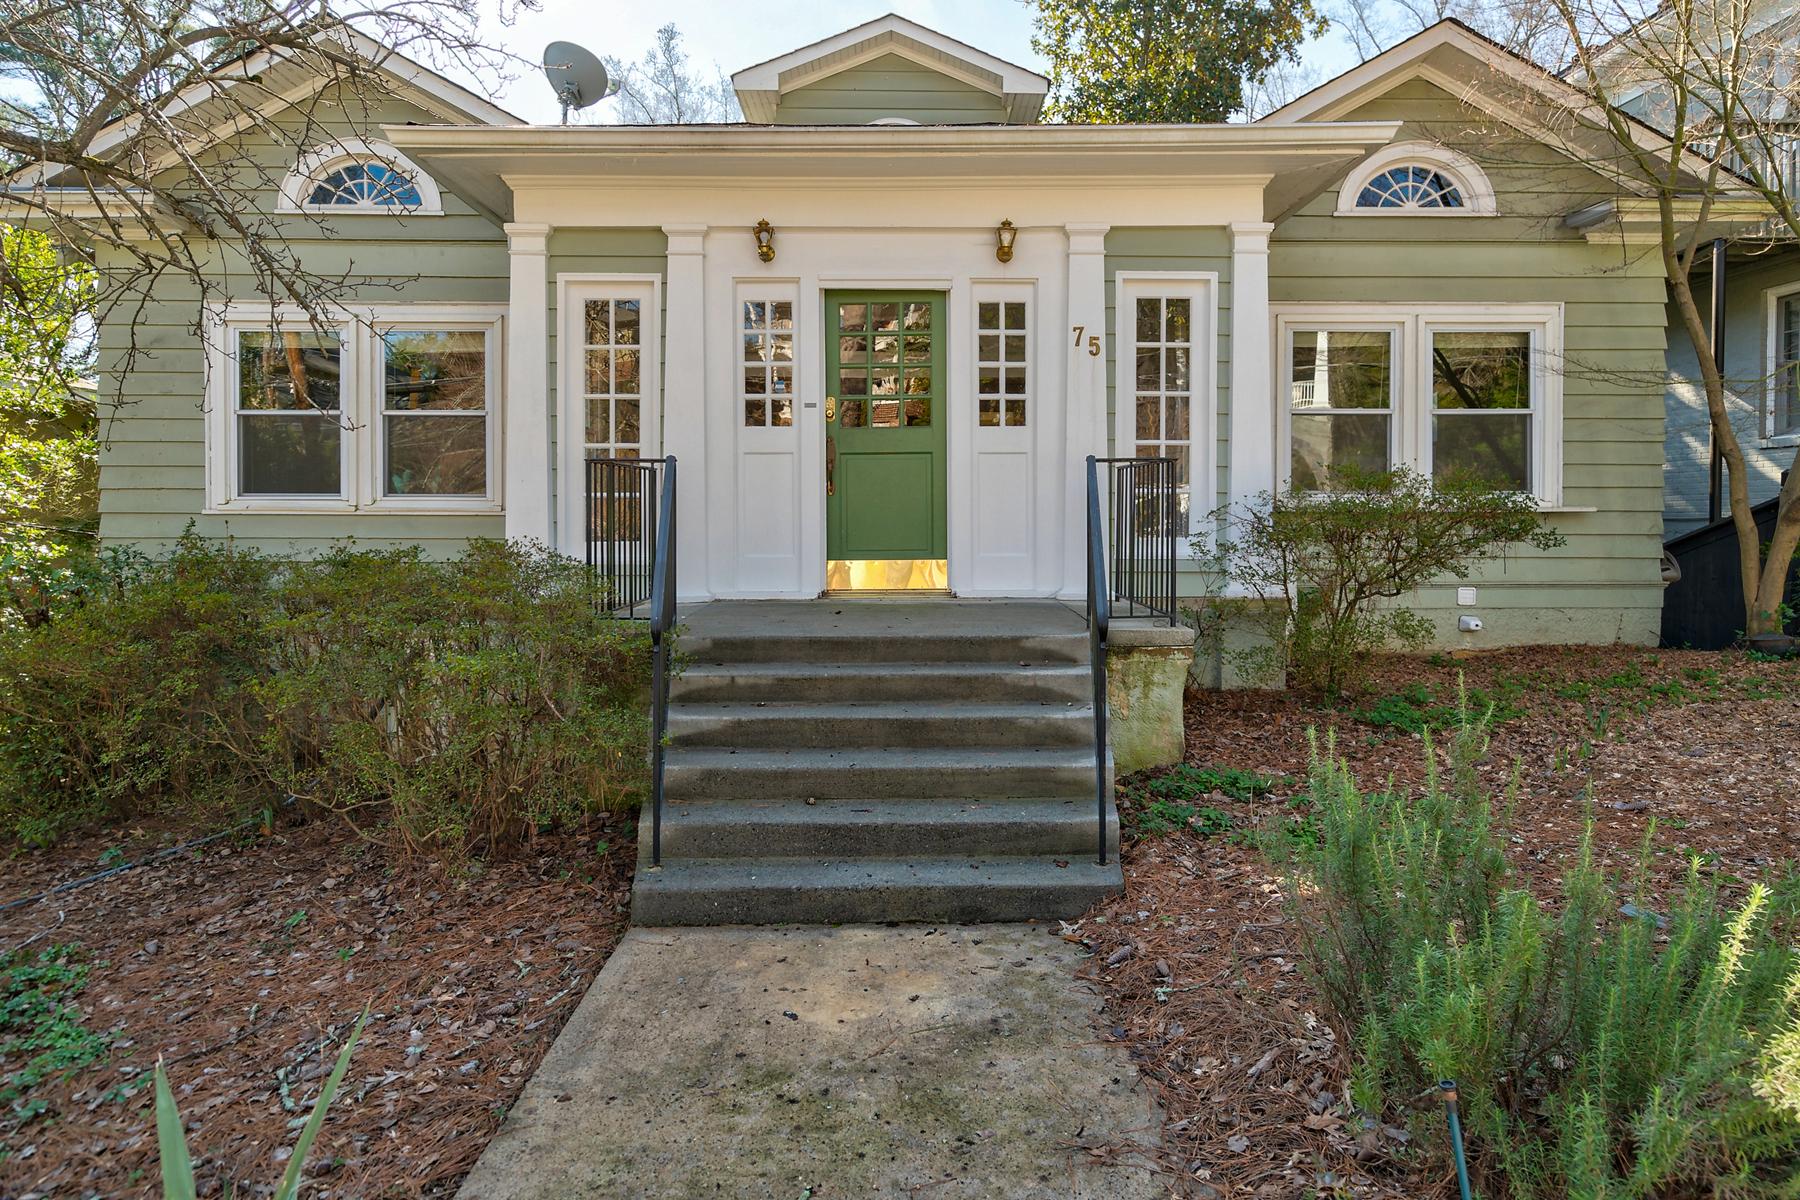 single family homes para Venda às Classic Craftsman In Ansley Park 75 Maddox Drive NE Atlanta, Geórgia 30309 Estados Unidos